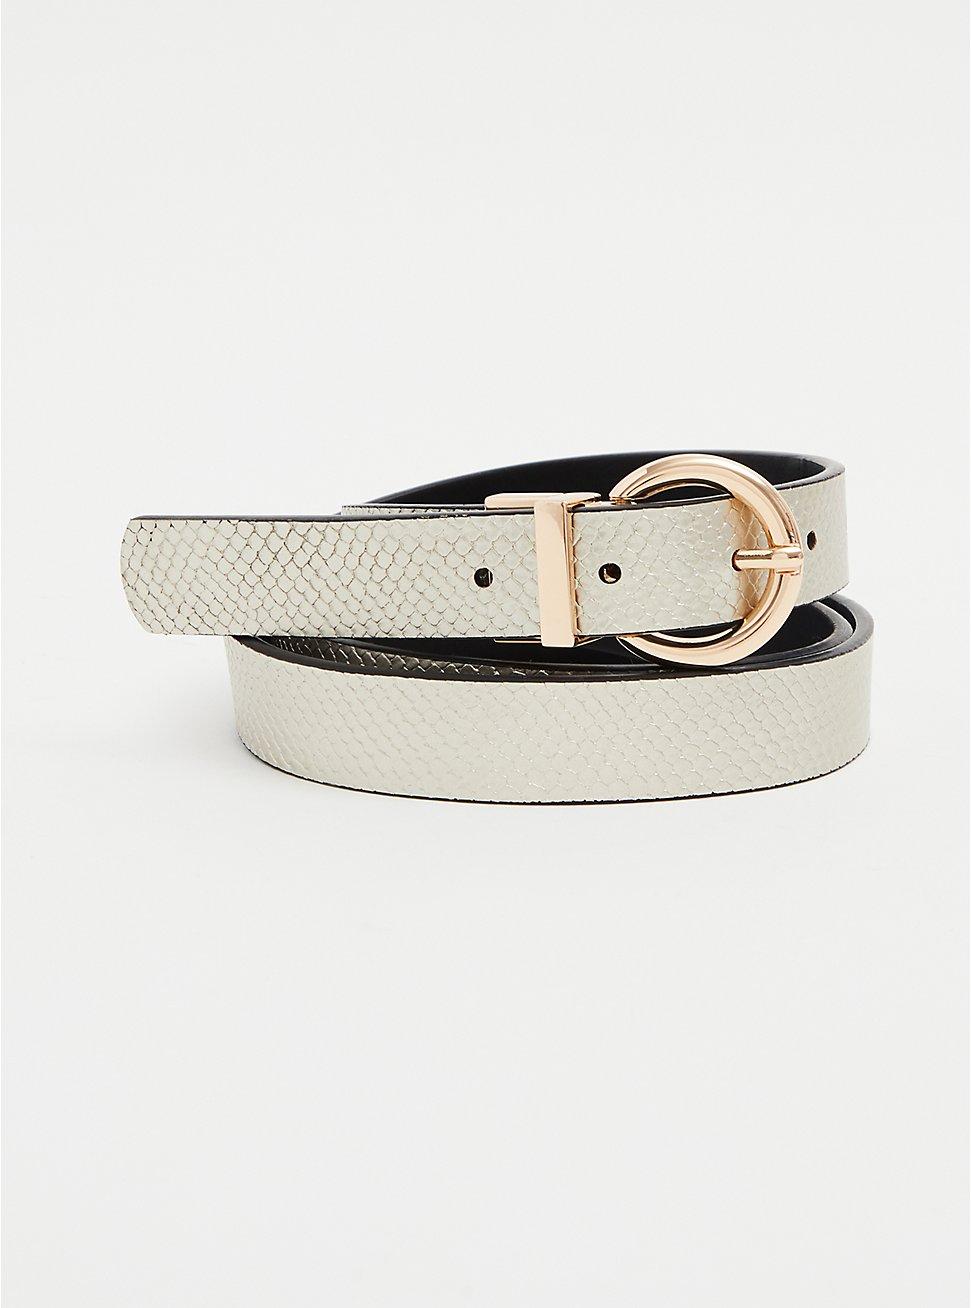 White Faux Snakeskin Leather Reversible Belt, MULTI, hi-res